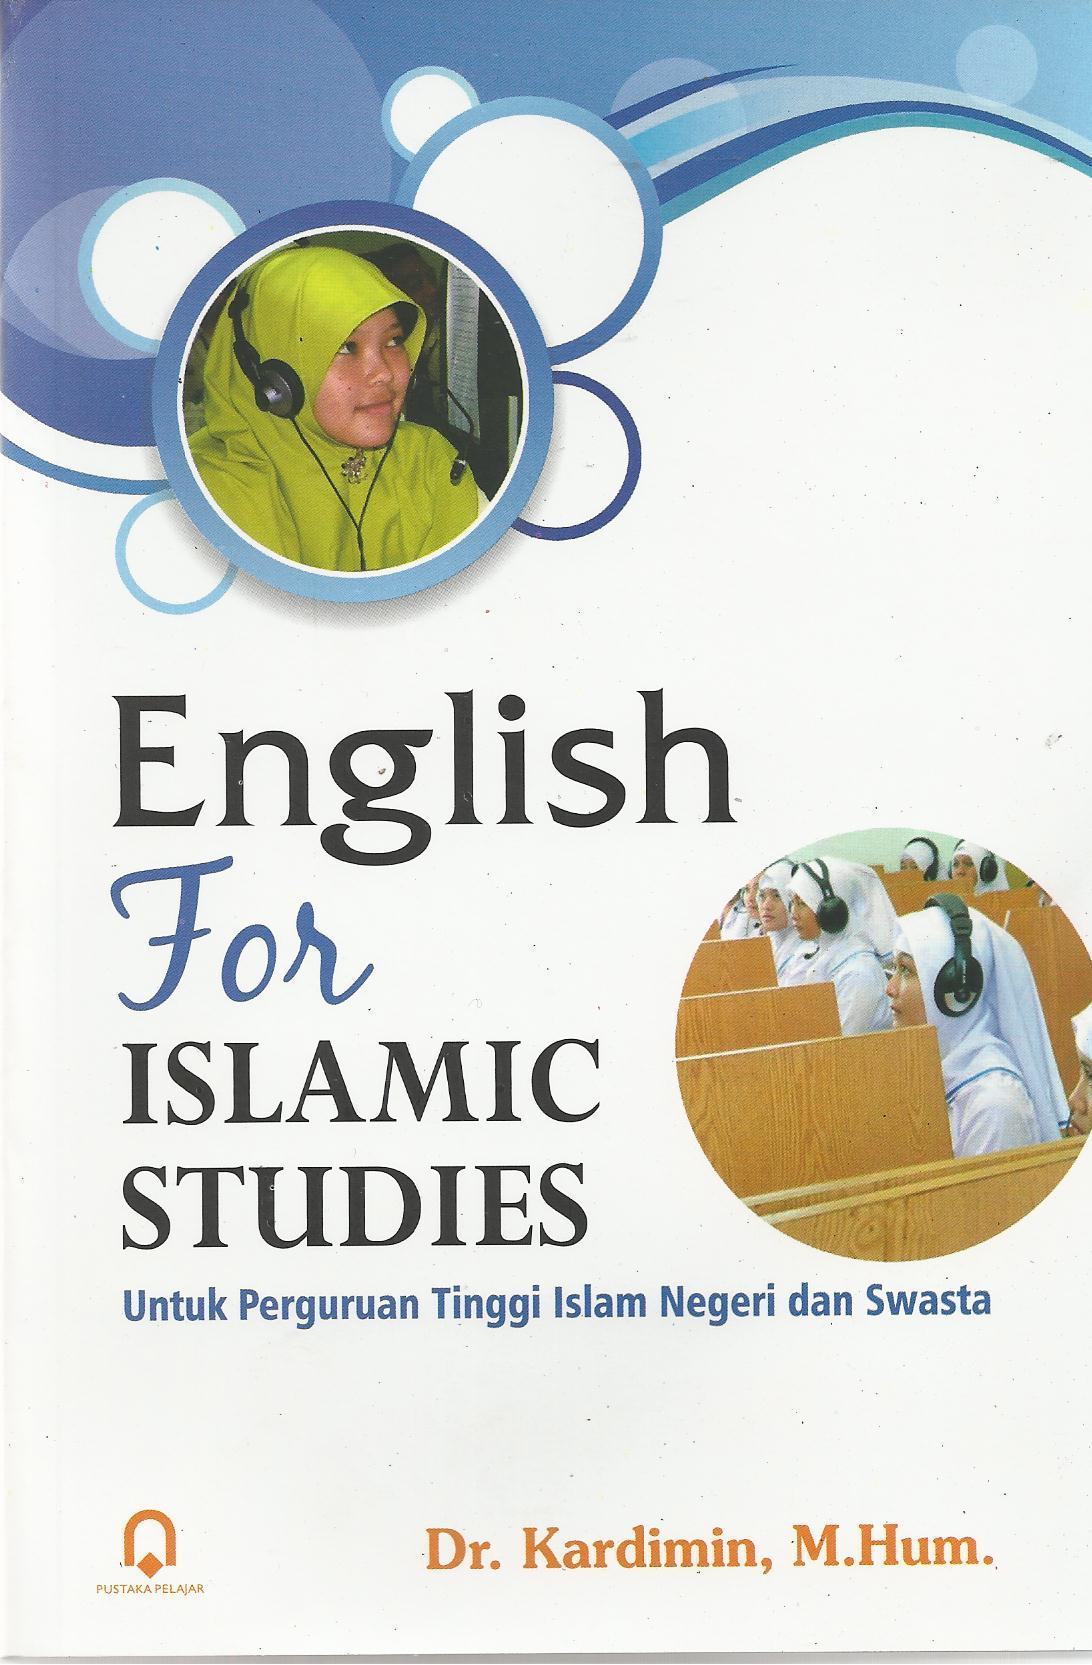 English for Islamic Studies Untuk Perguruan Tinggi Islam Negeri dan Swasta